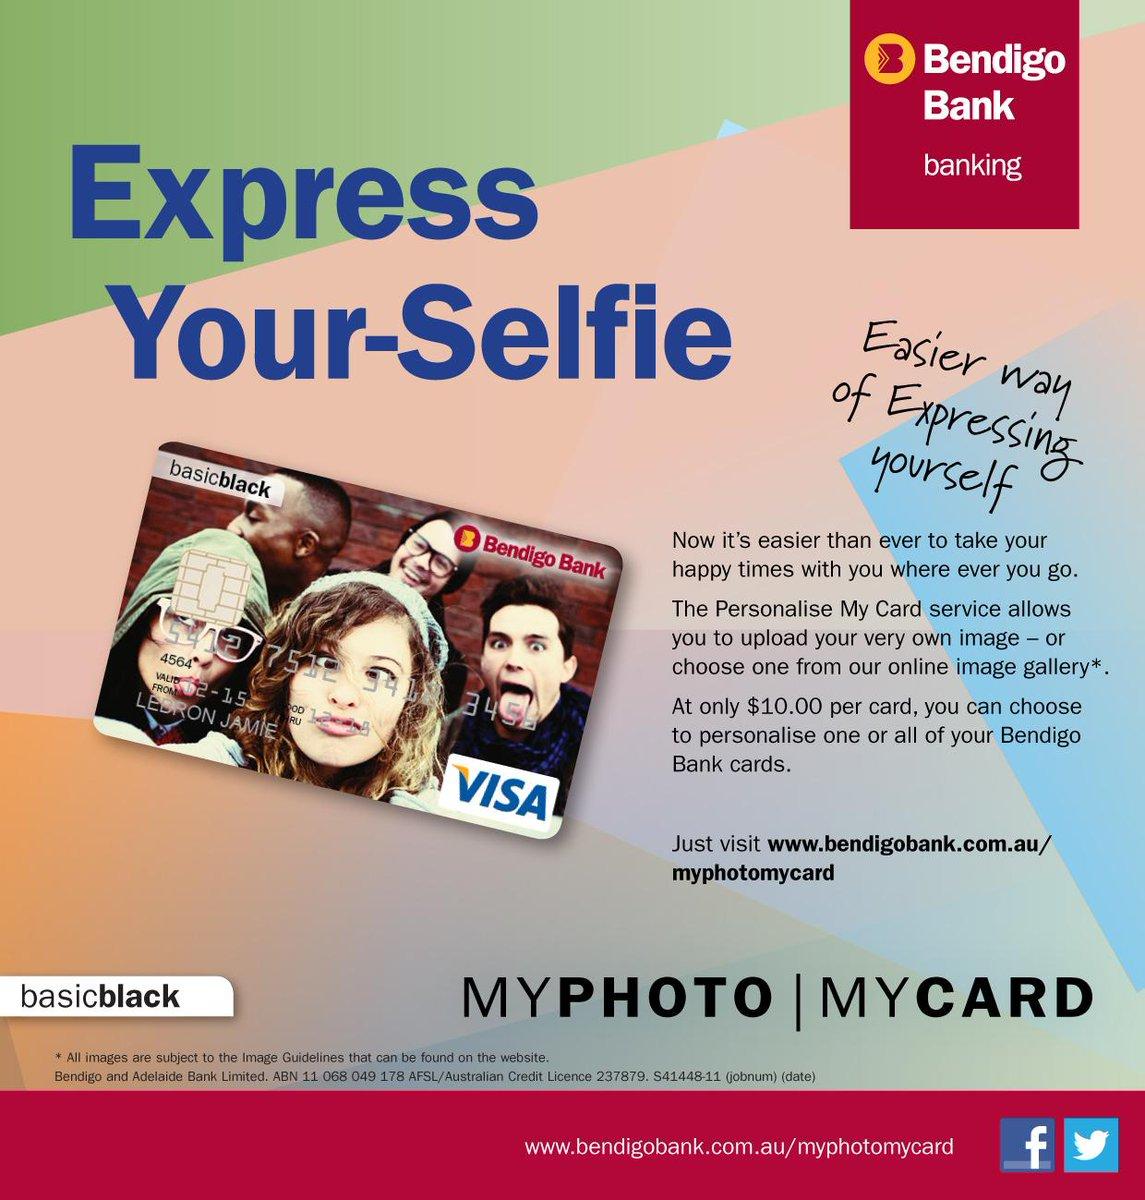 how to get a new bendigo bank card